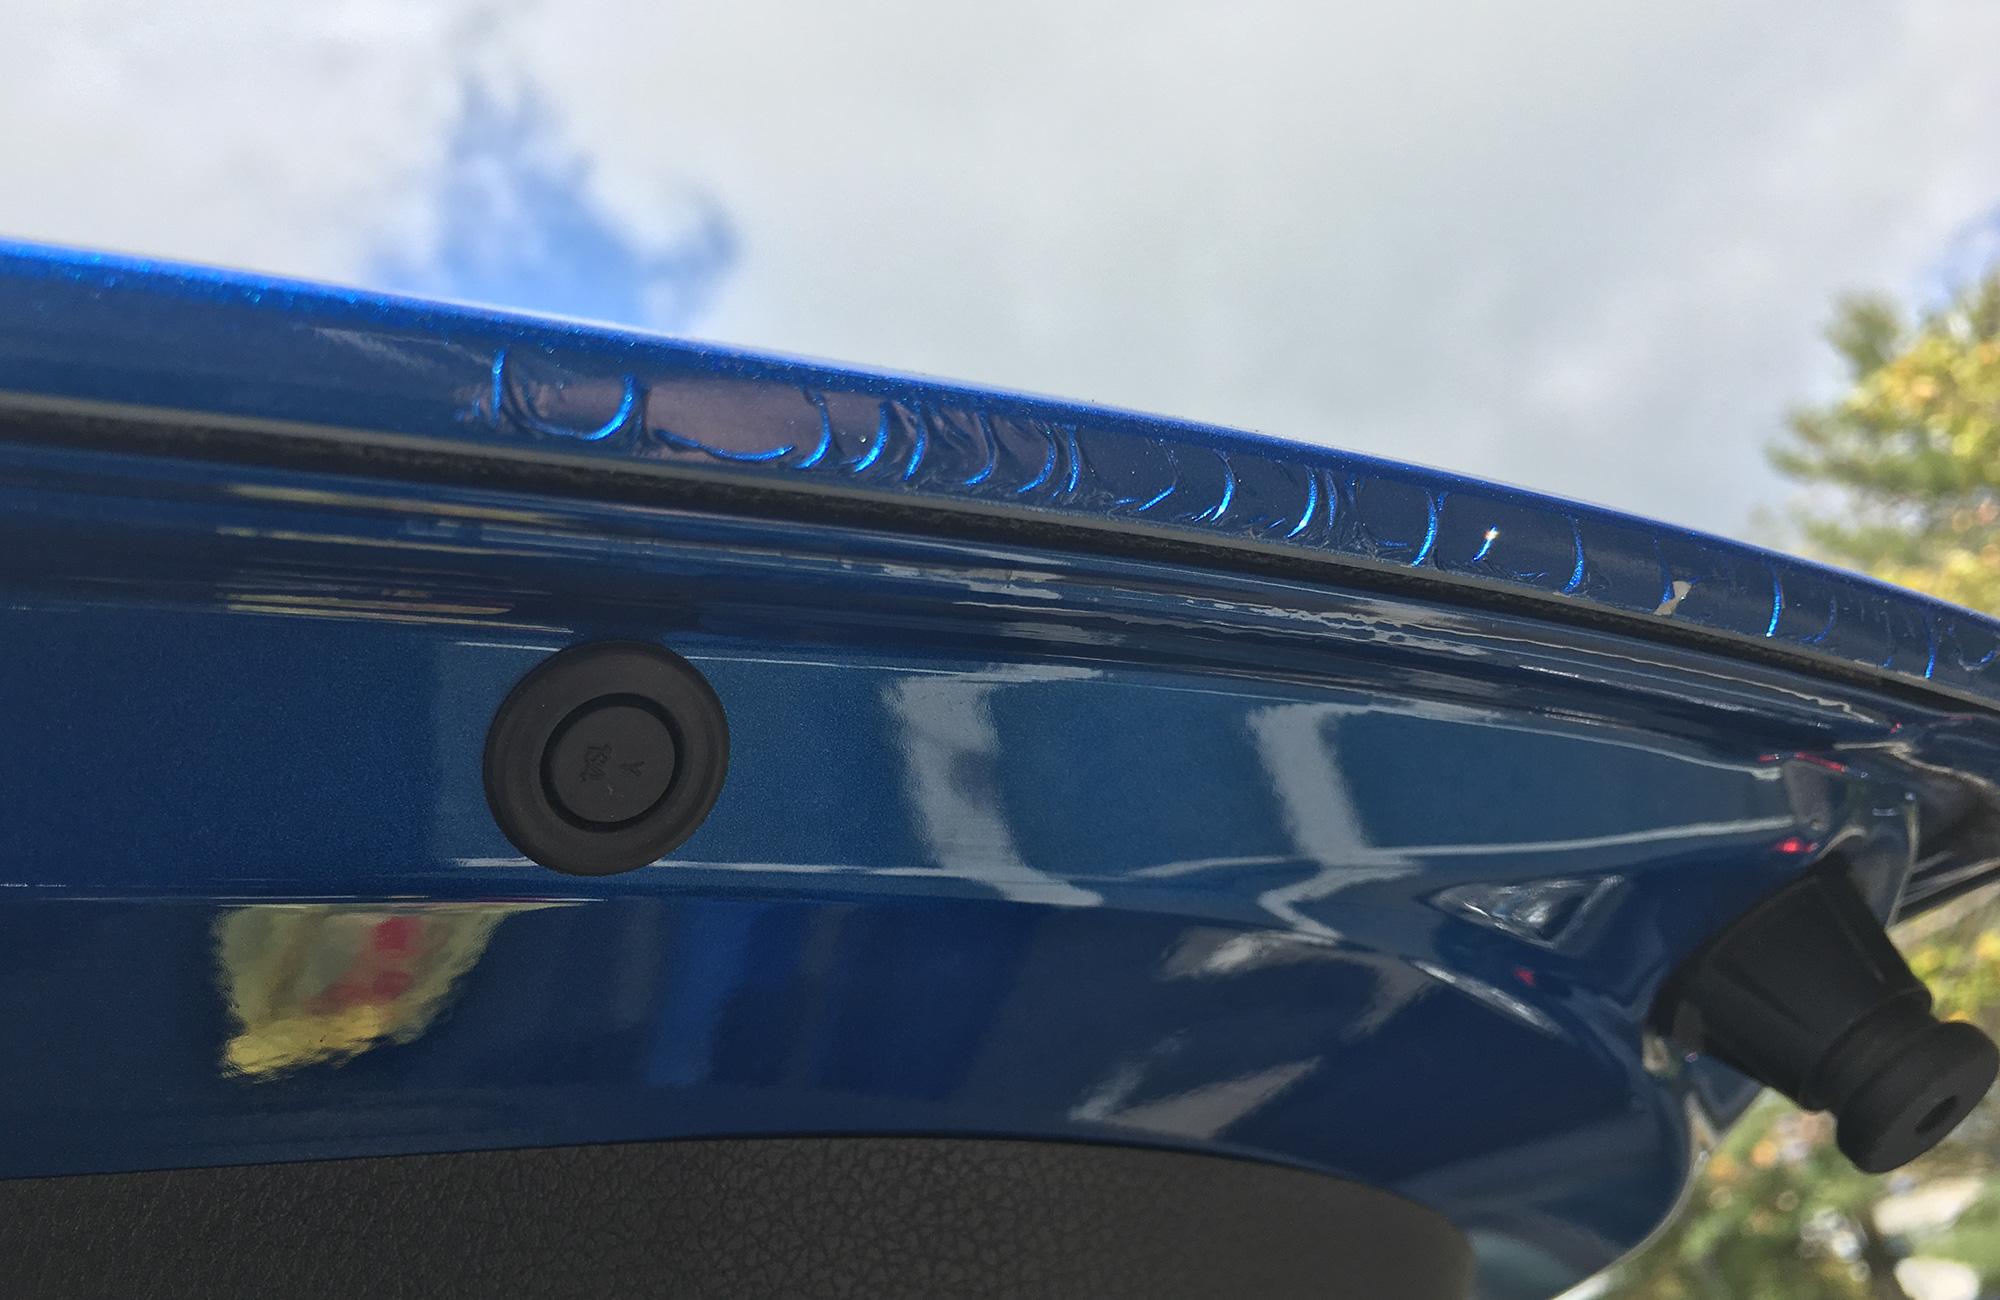 Kia Stinger paint issue